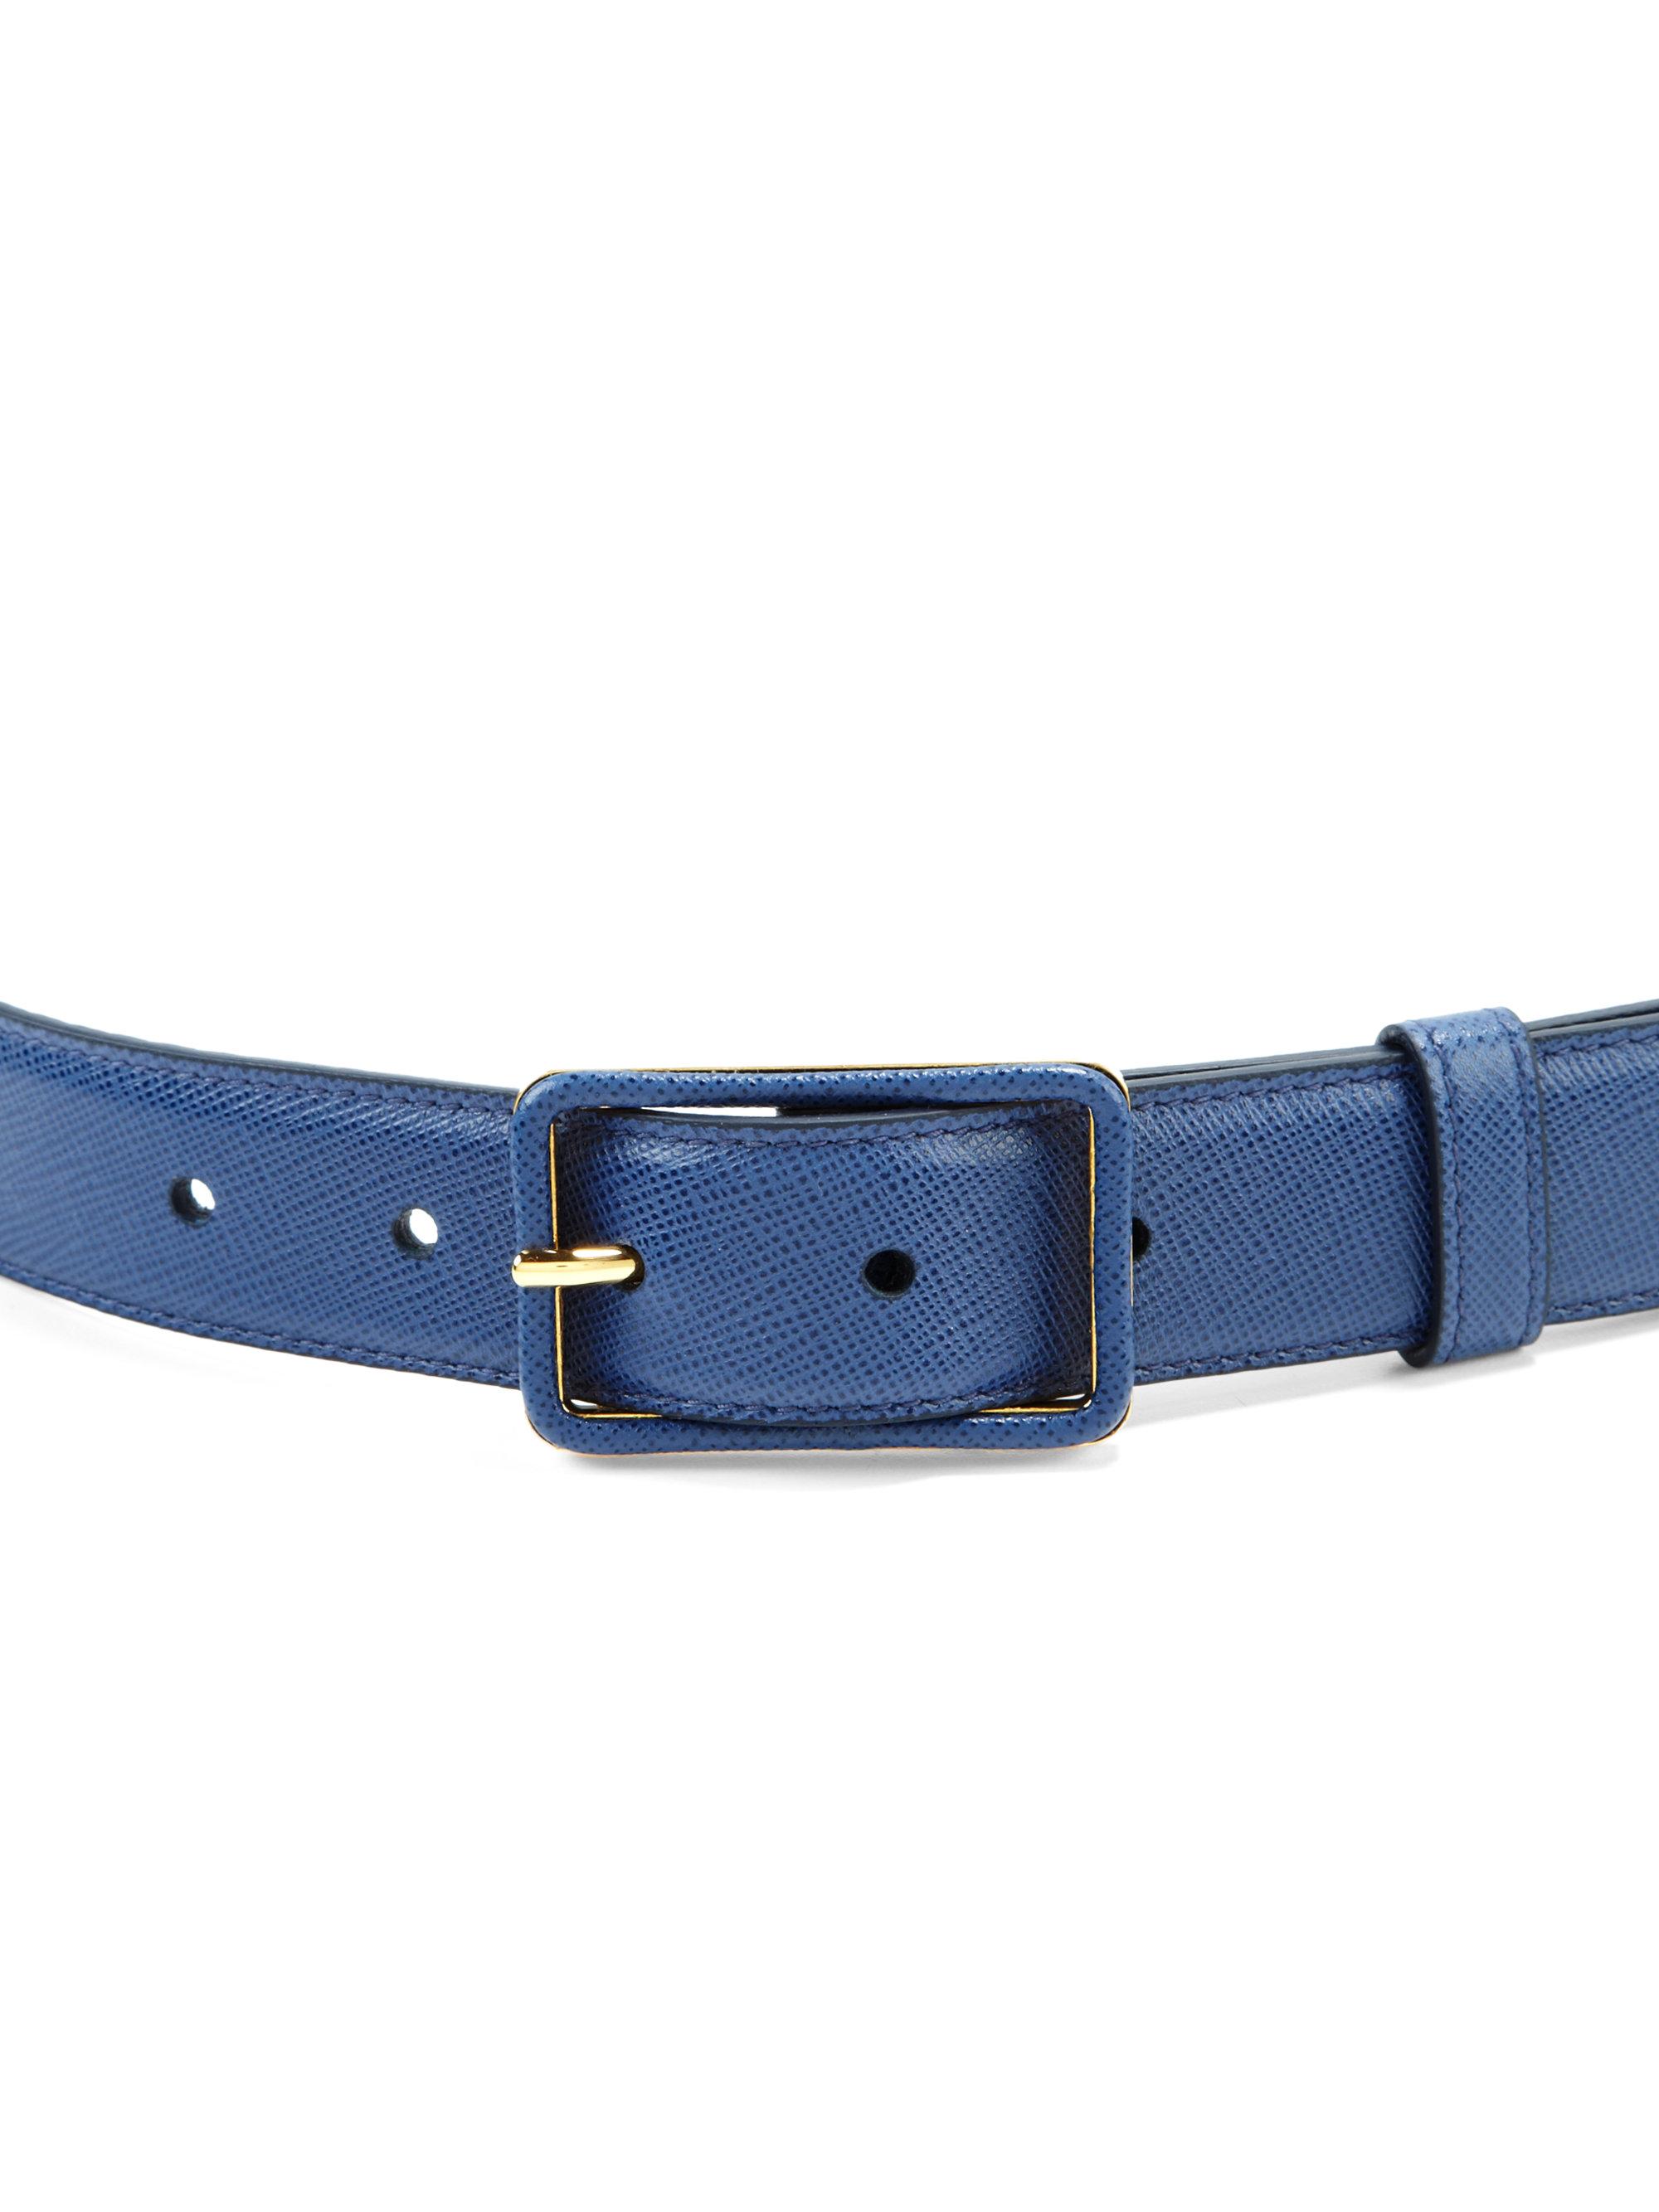 Prada Saffiano Leather Belt In Blue